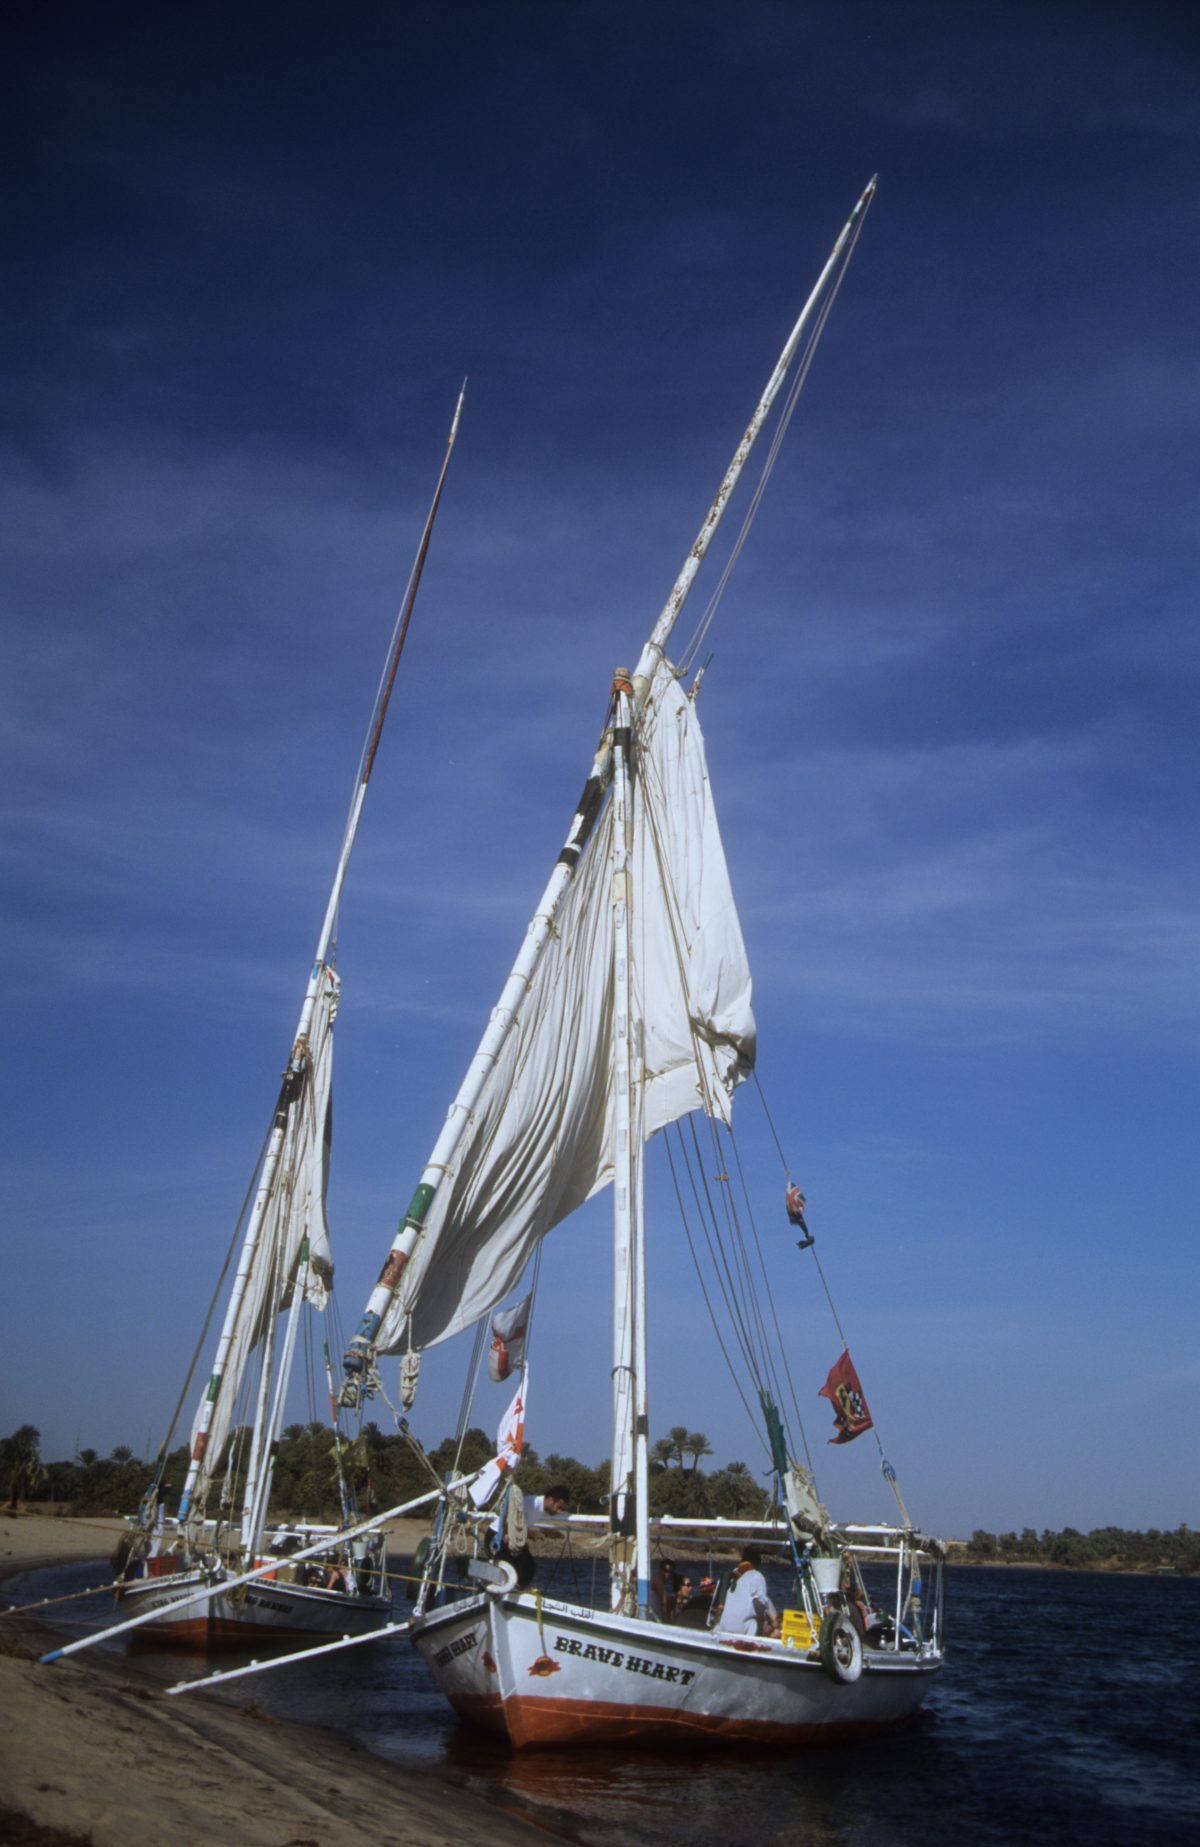 Camp spot, boat